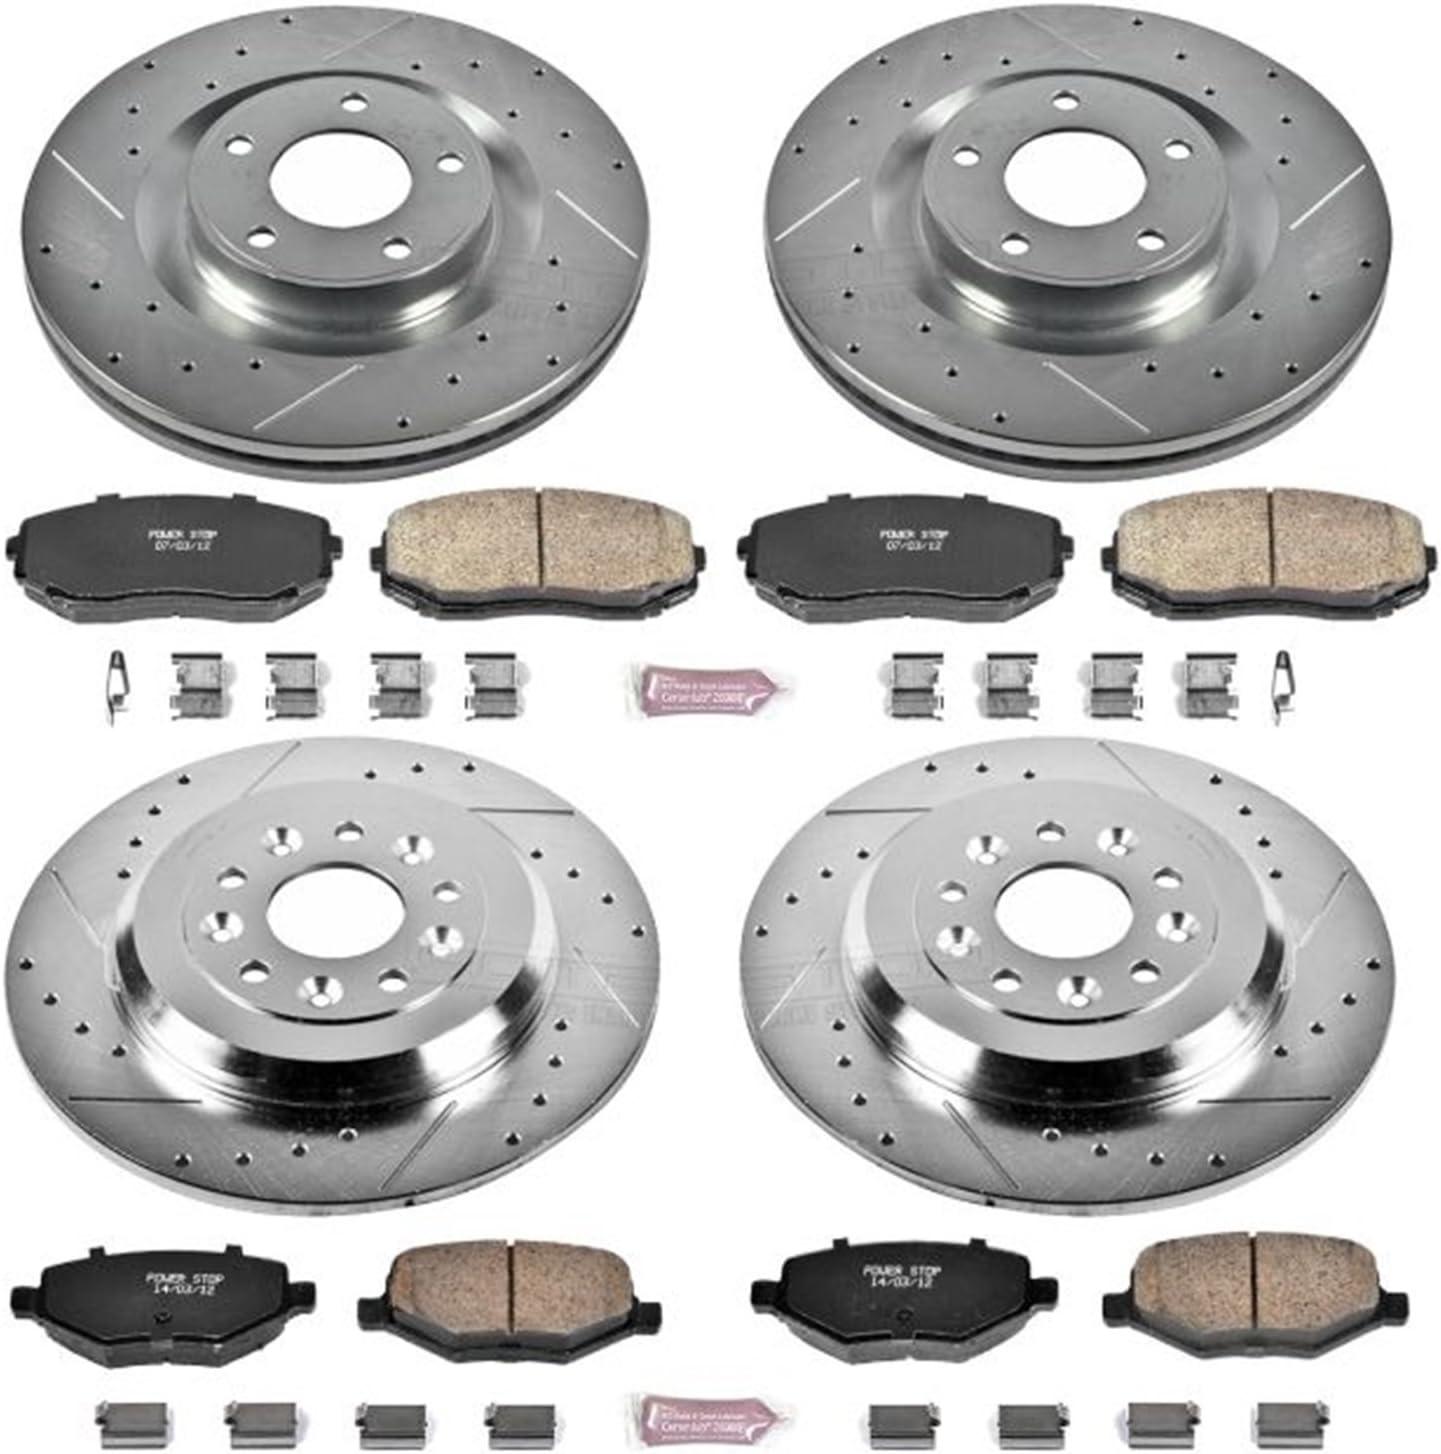 Front /& Rear All 4 Drilled /& Slotted Brake Rotors /& Ceramic Brake Pads Evo 8 9